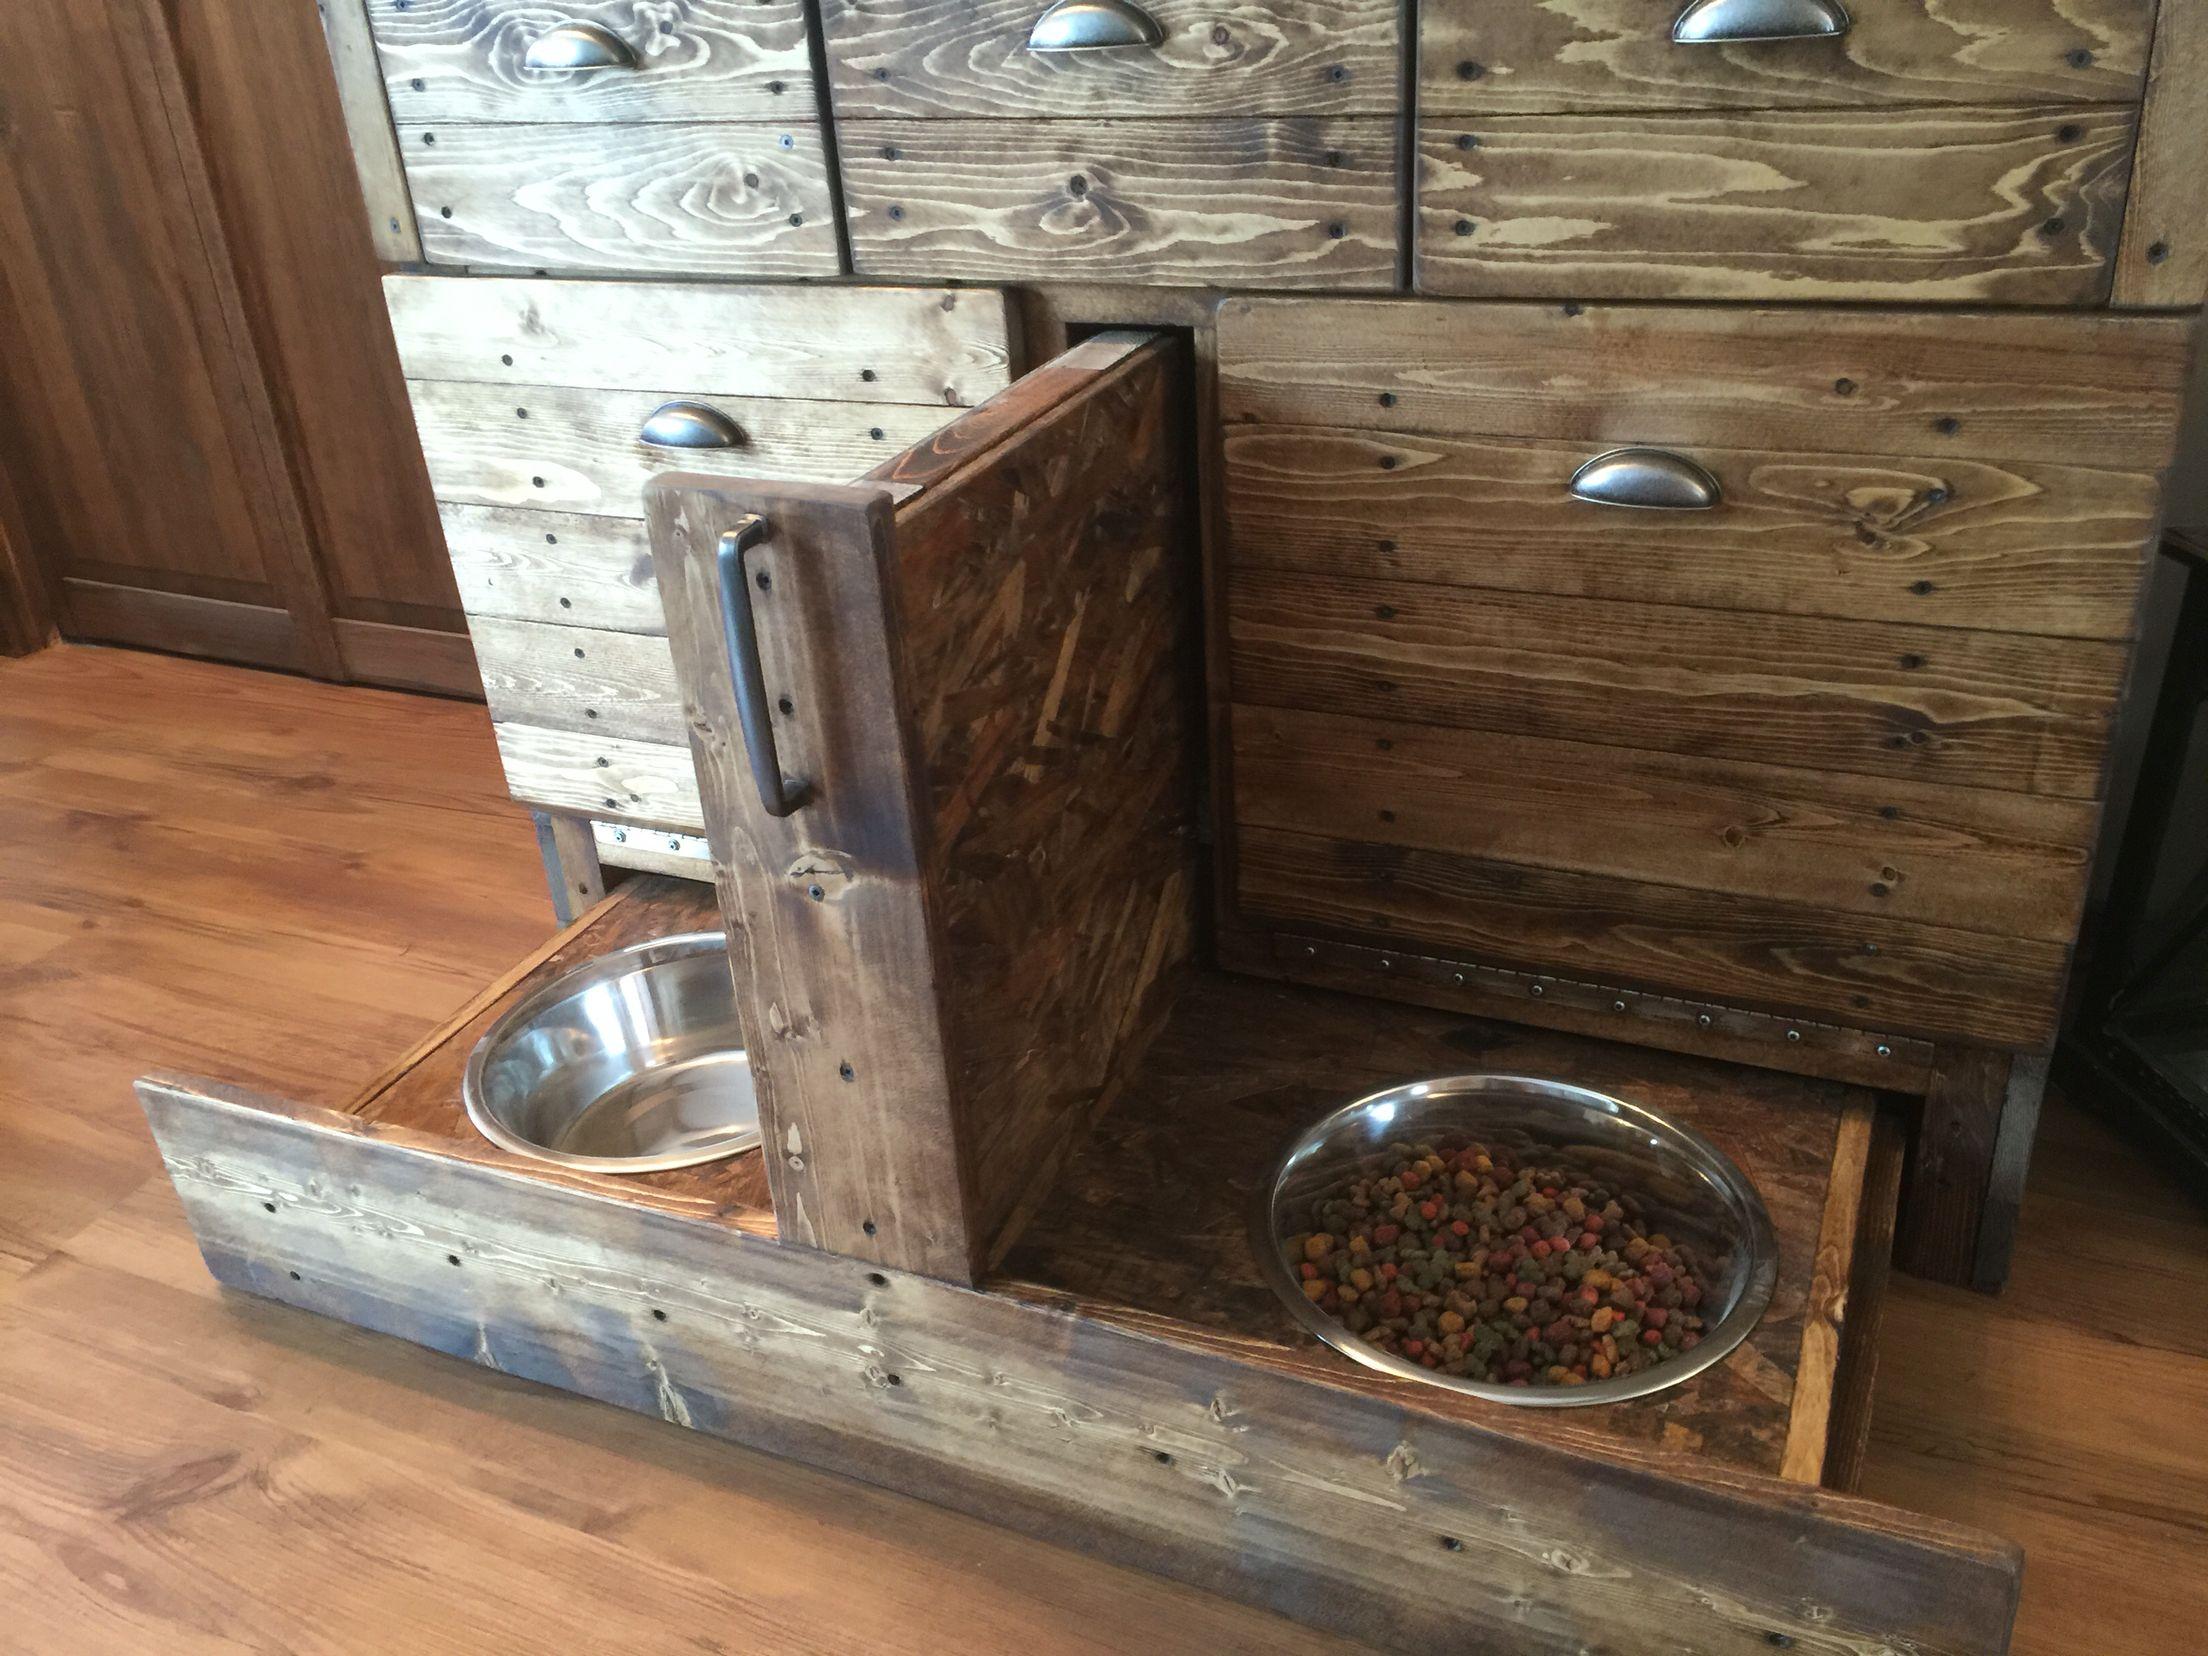 Dog feeding station and dog food storage. Cat food